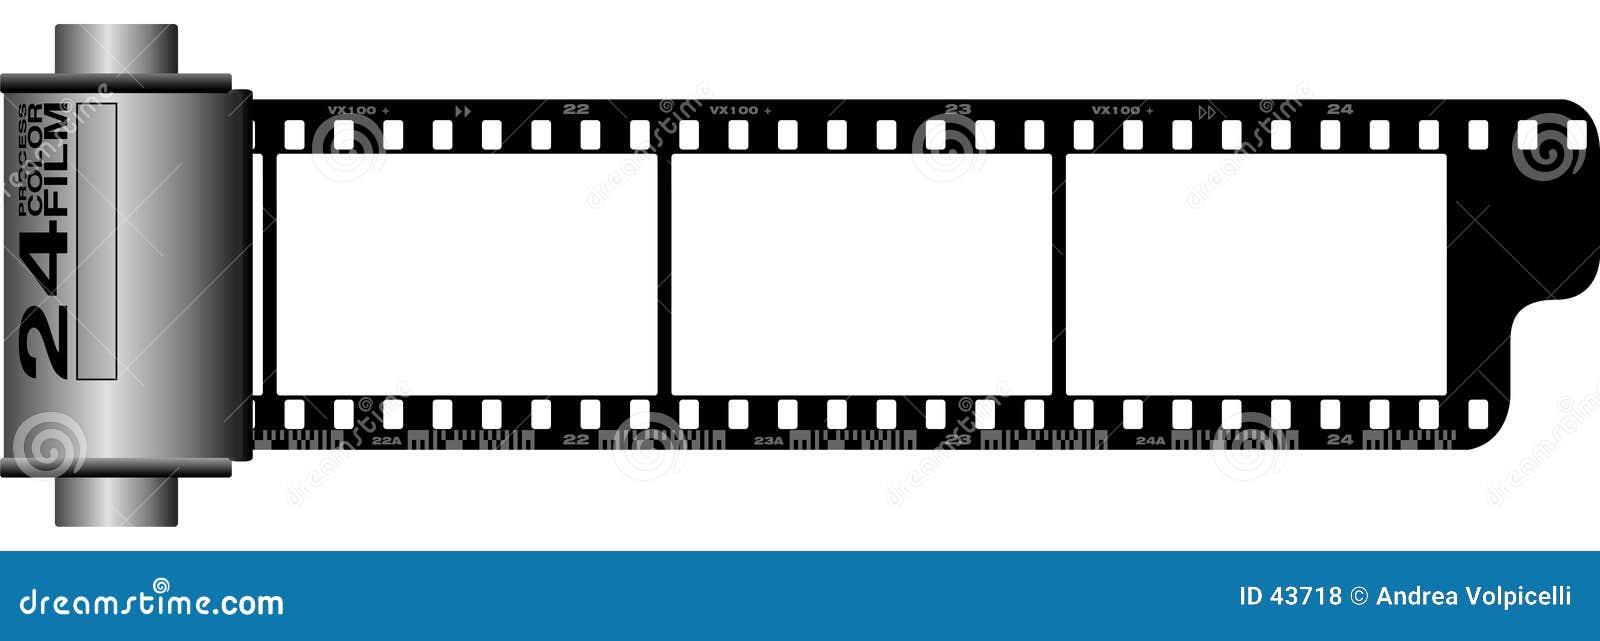 35 Millimeter Filmrollen-